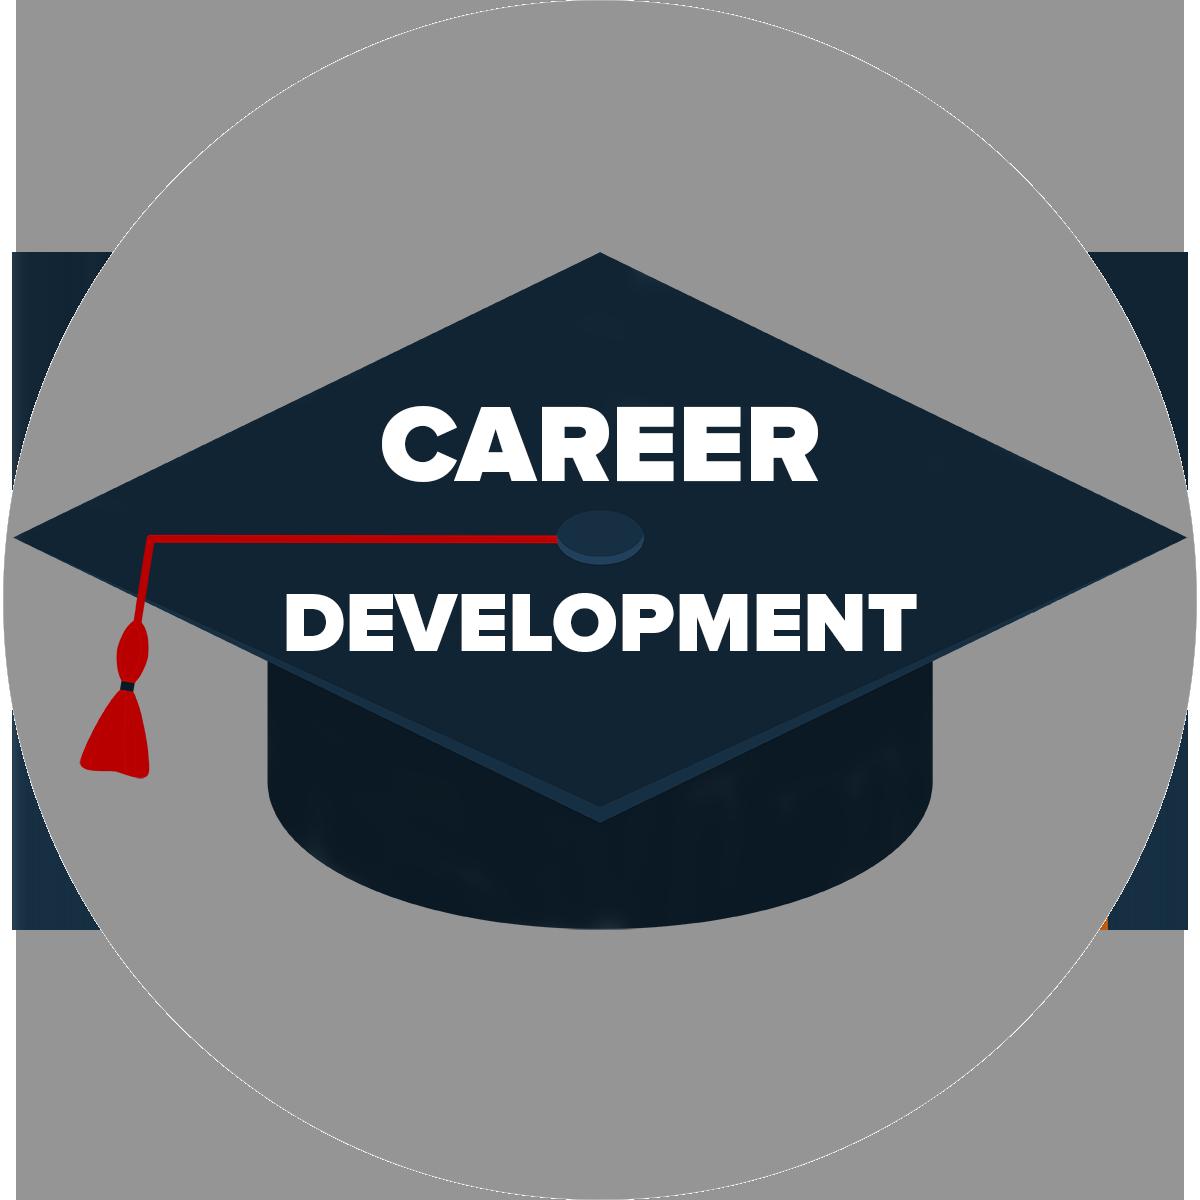 Attend career fair information